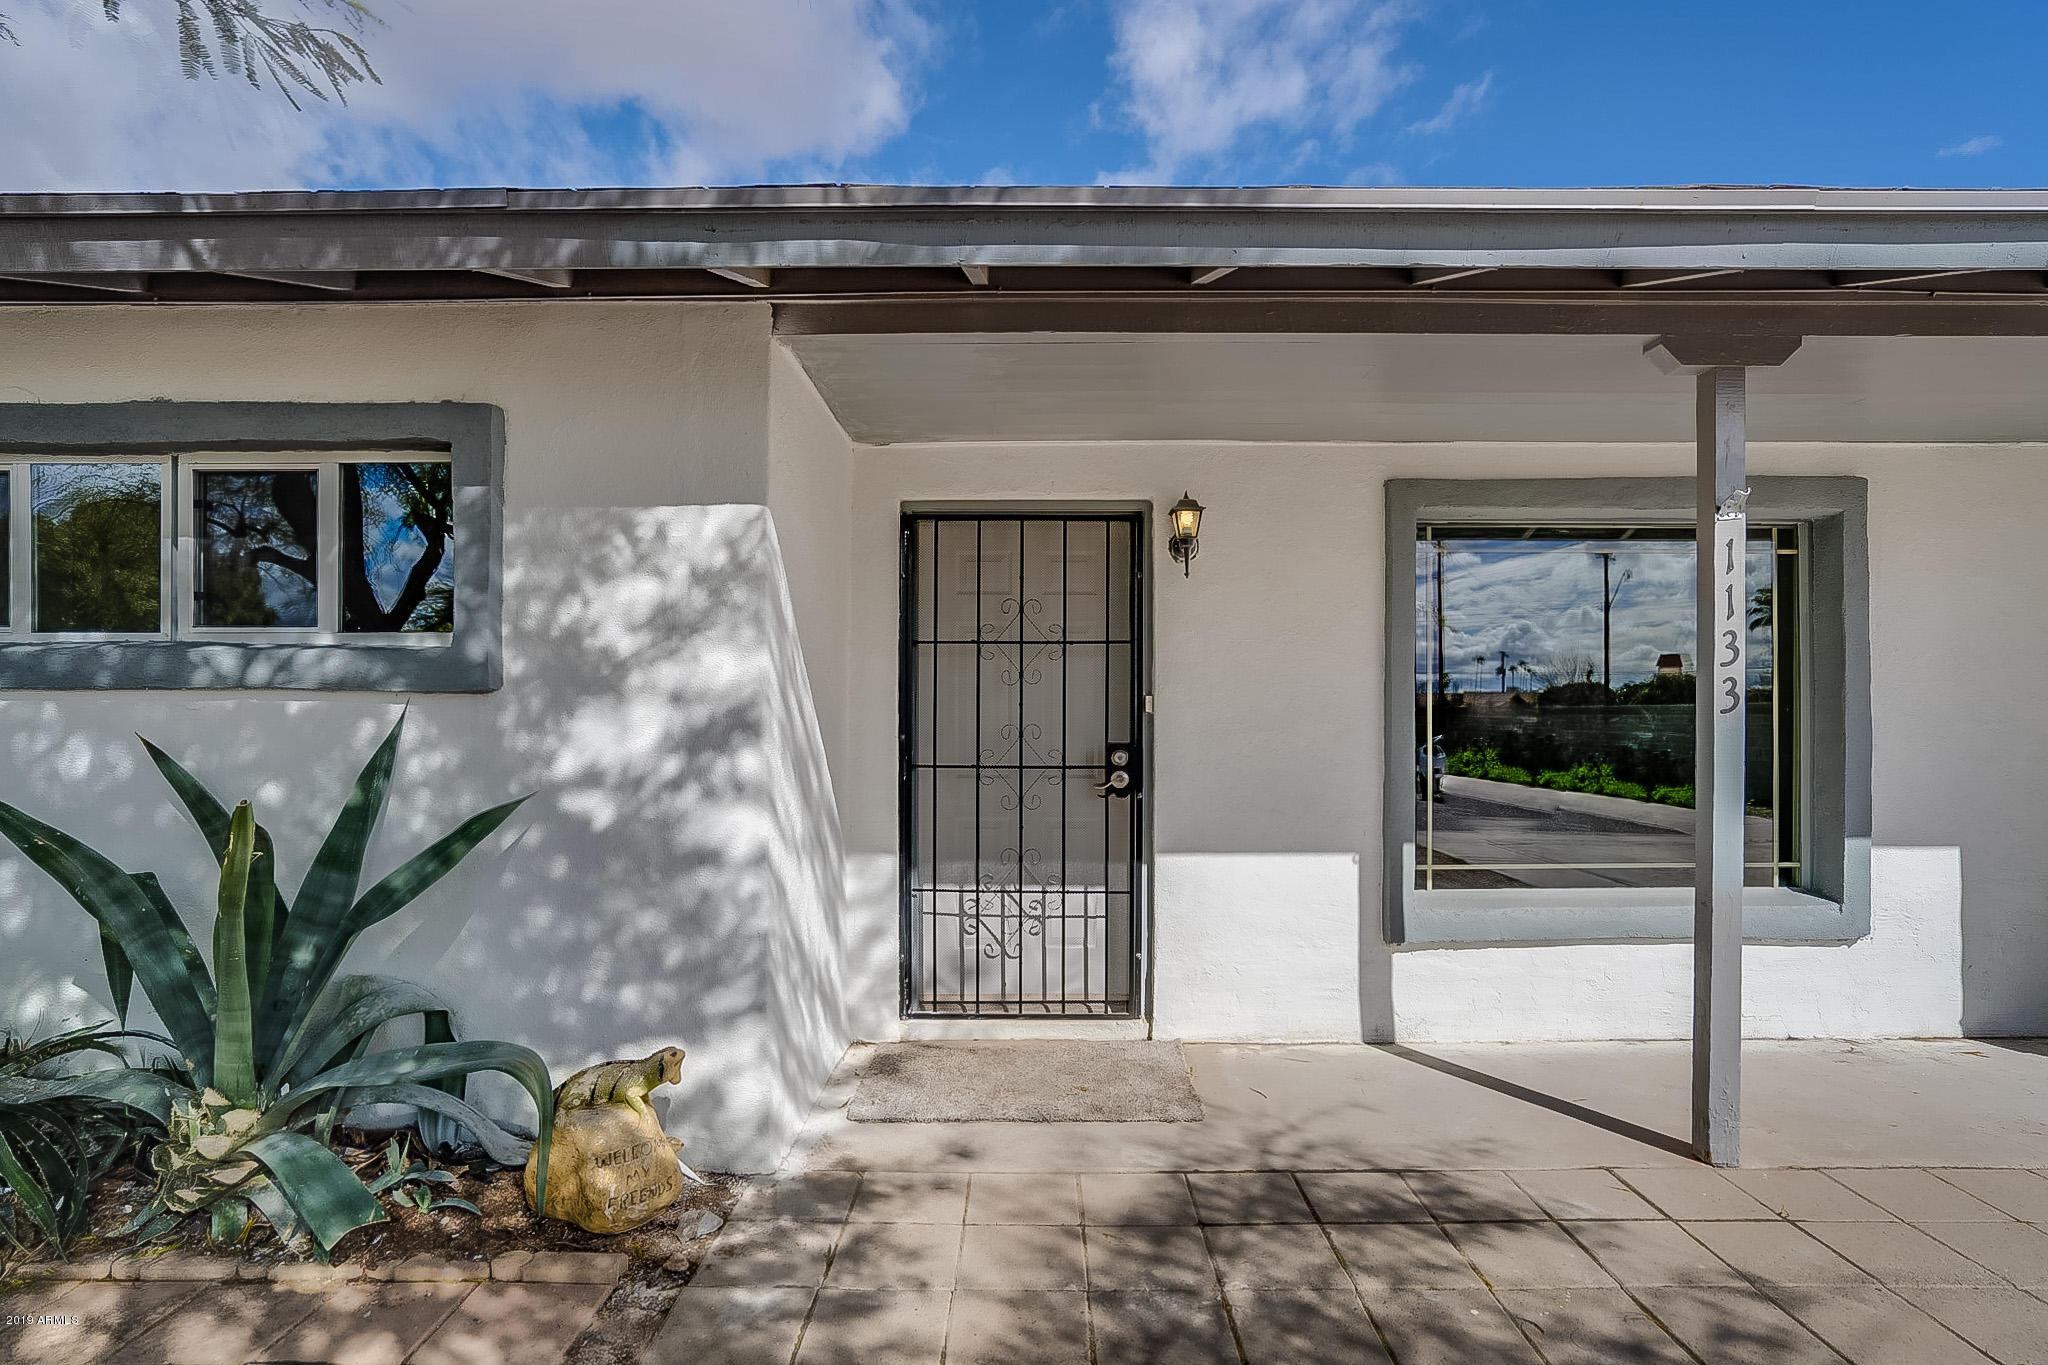 MLS 5879651 1133 N MESQUITE Lane, Coolidge, AZ 85128 Coolidge AZ Private Pool